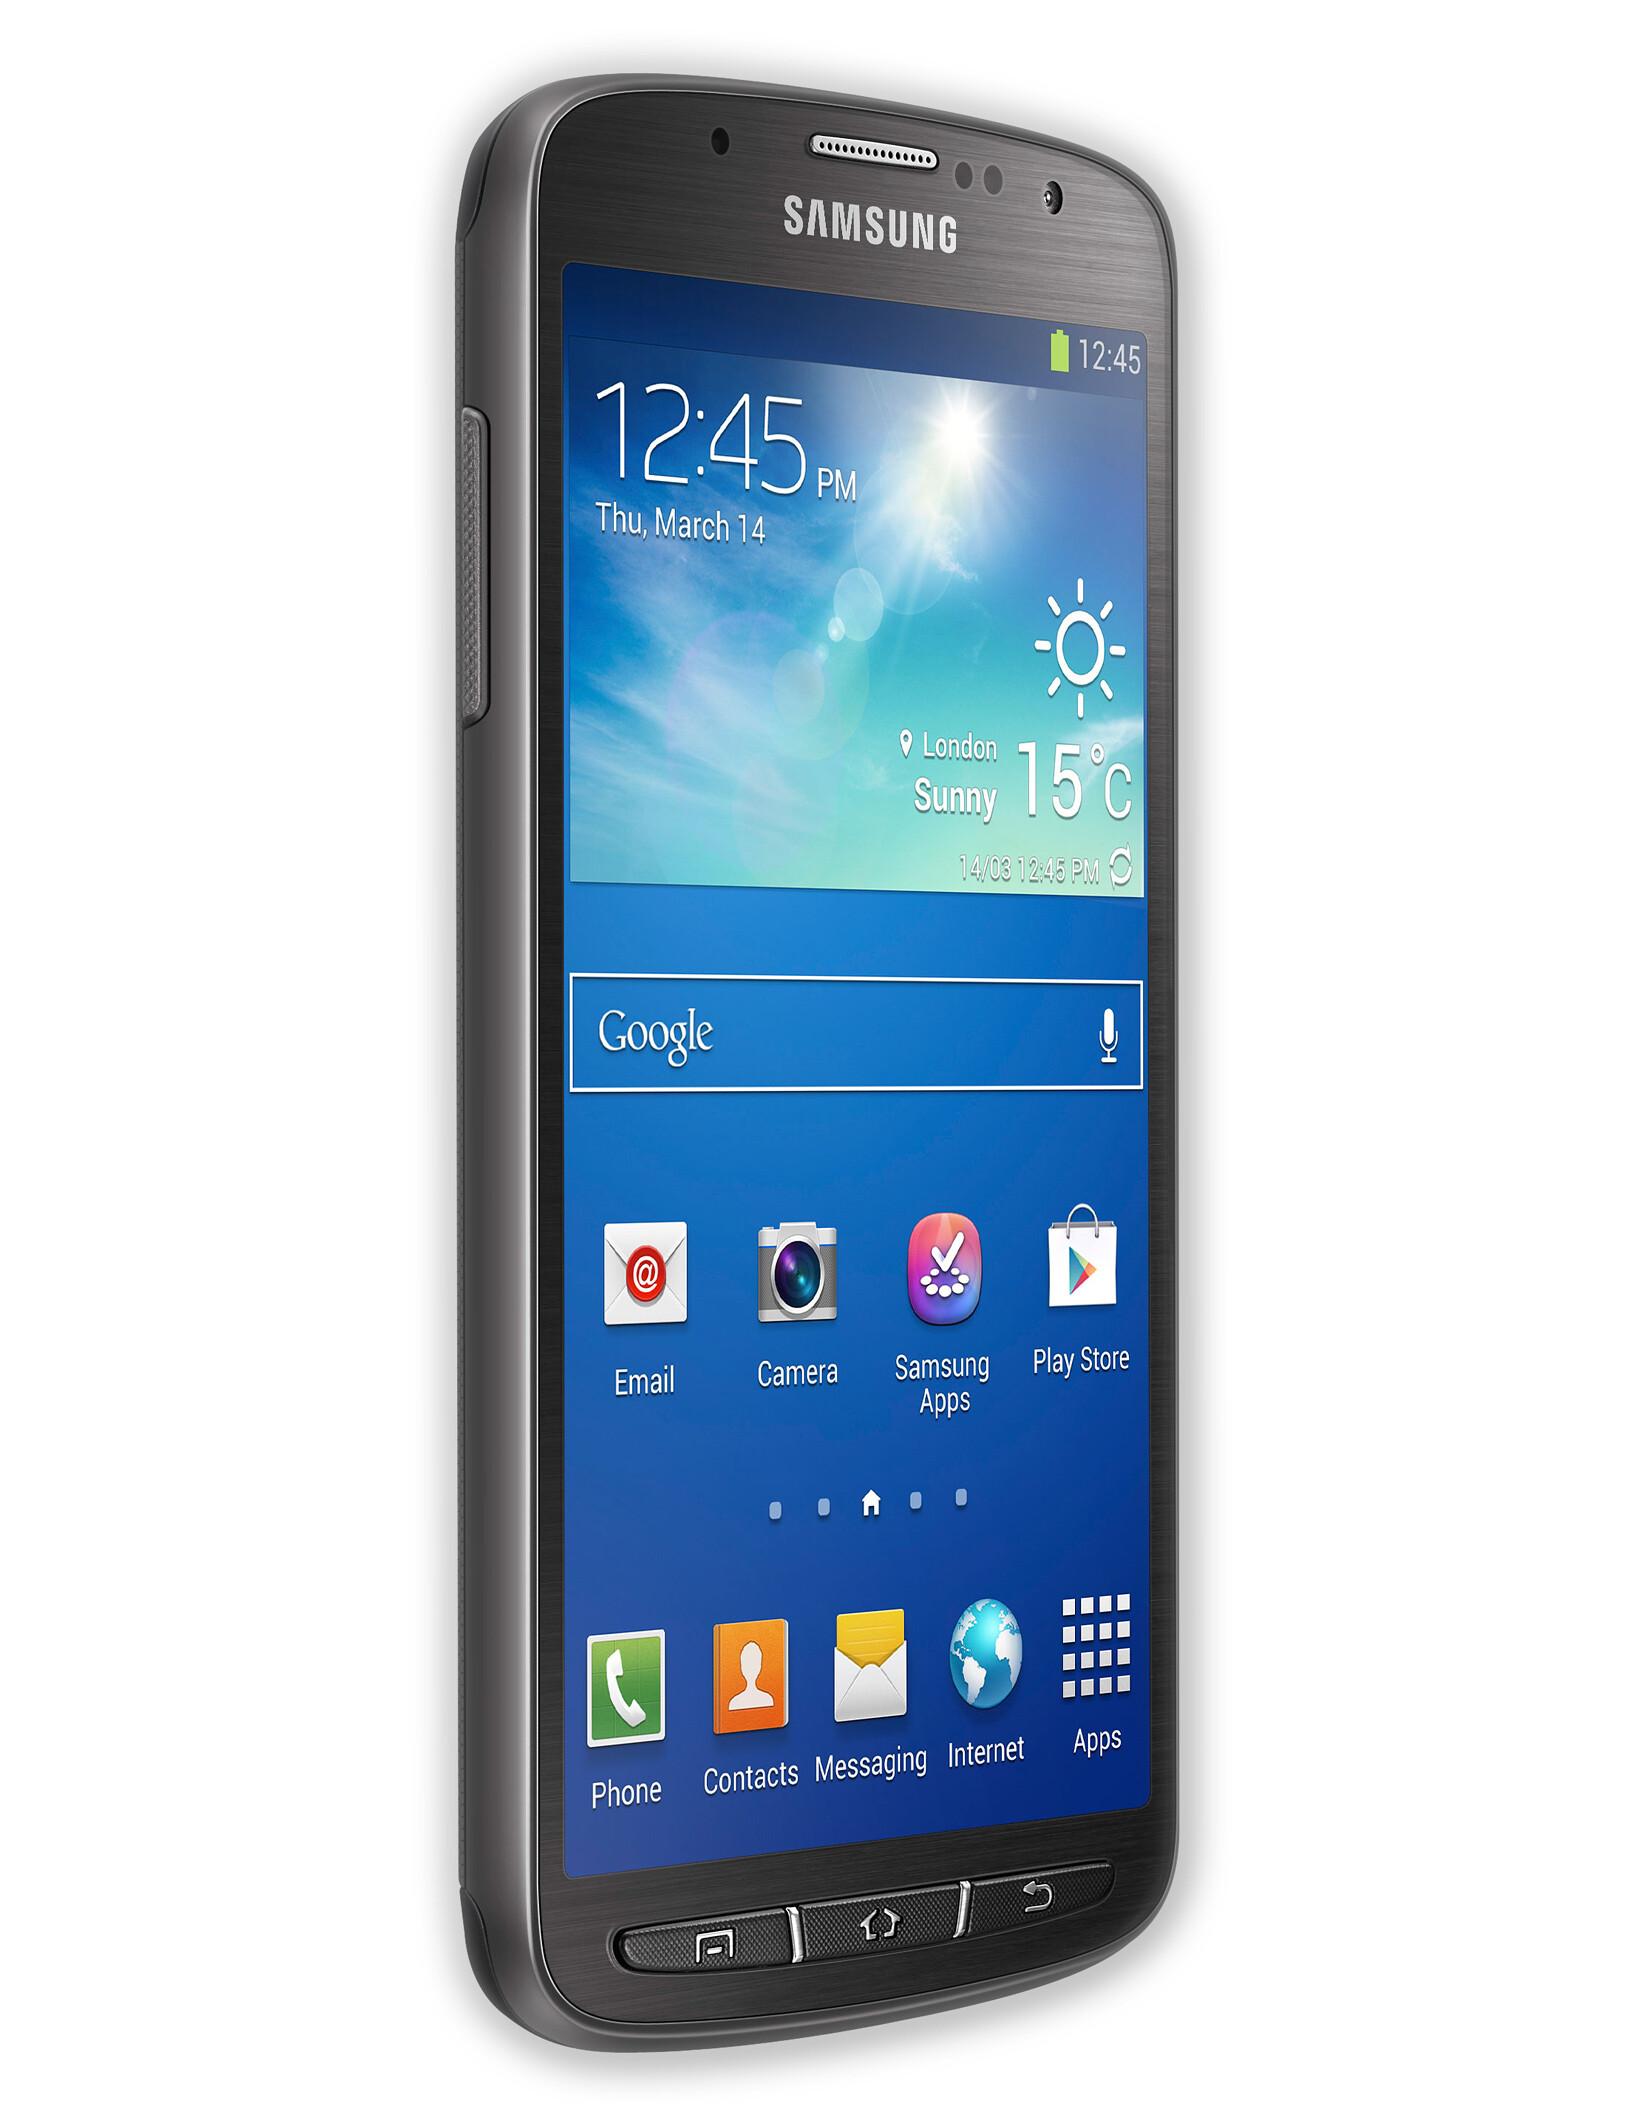 Samsung galaxy s4 release date in Australia